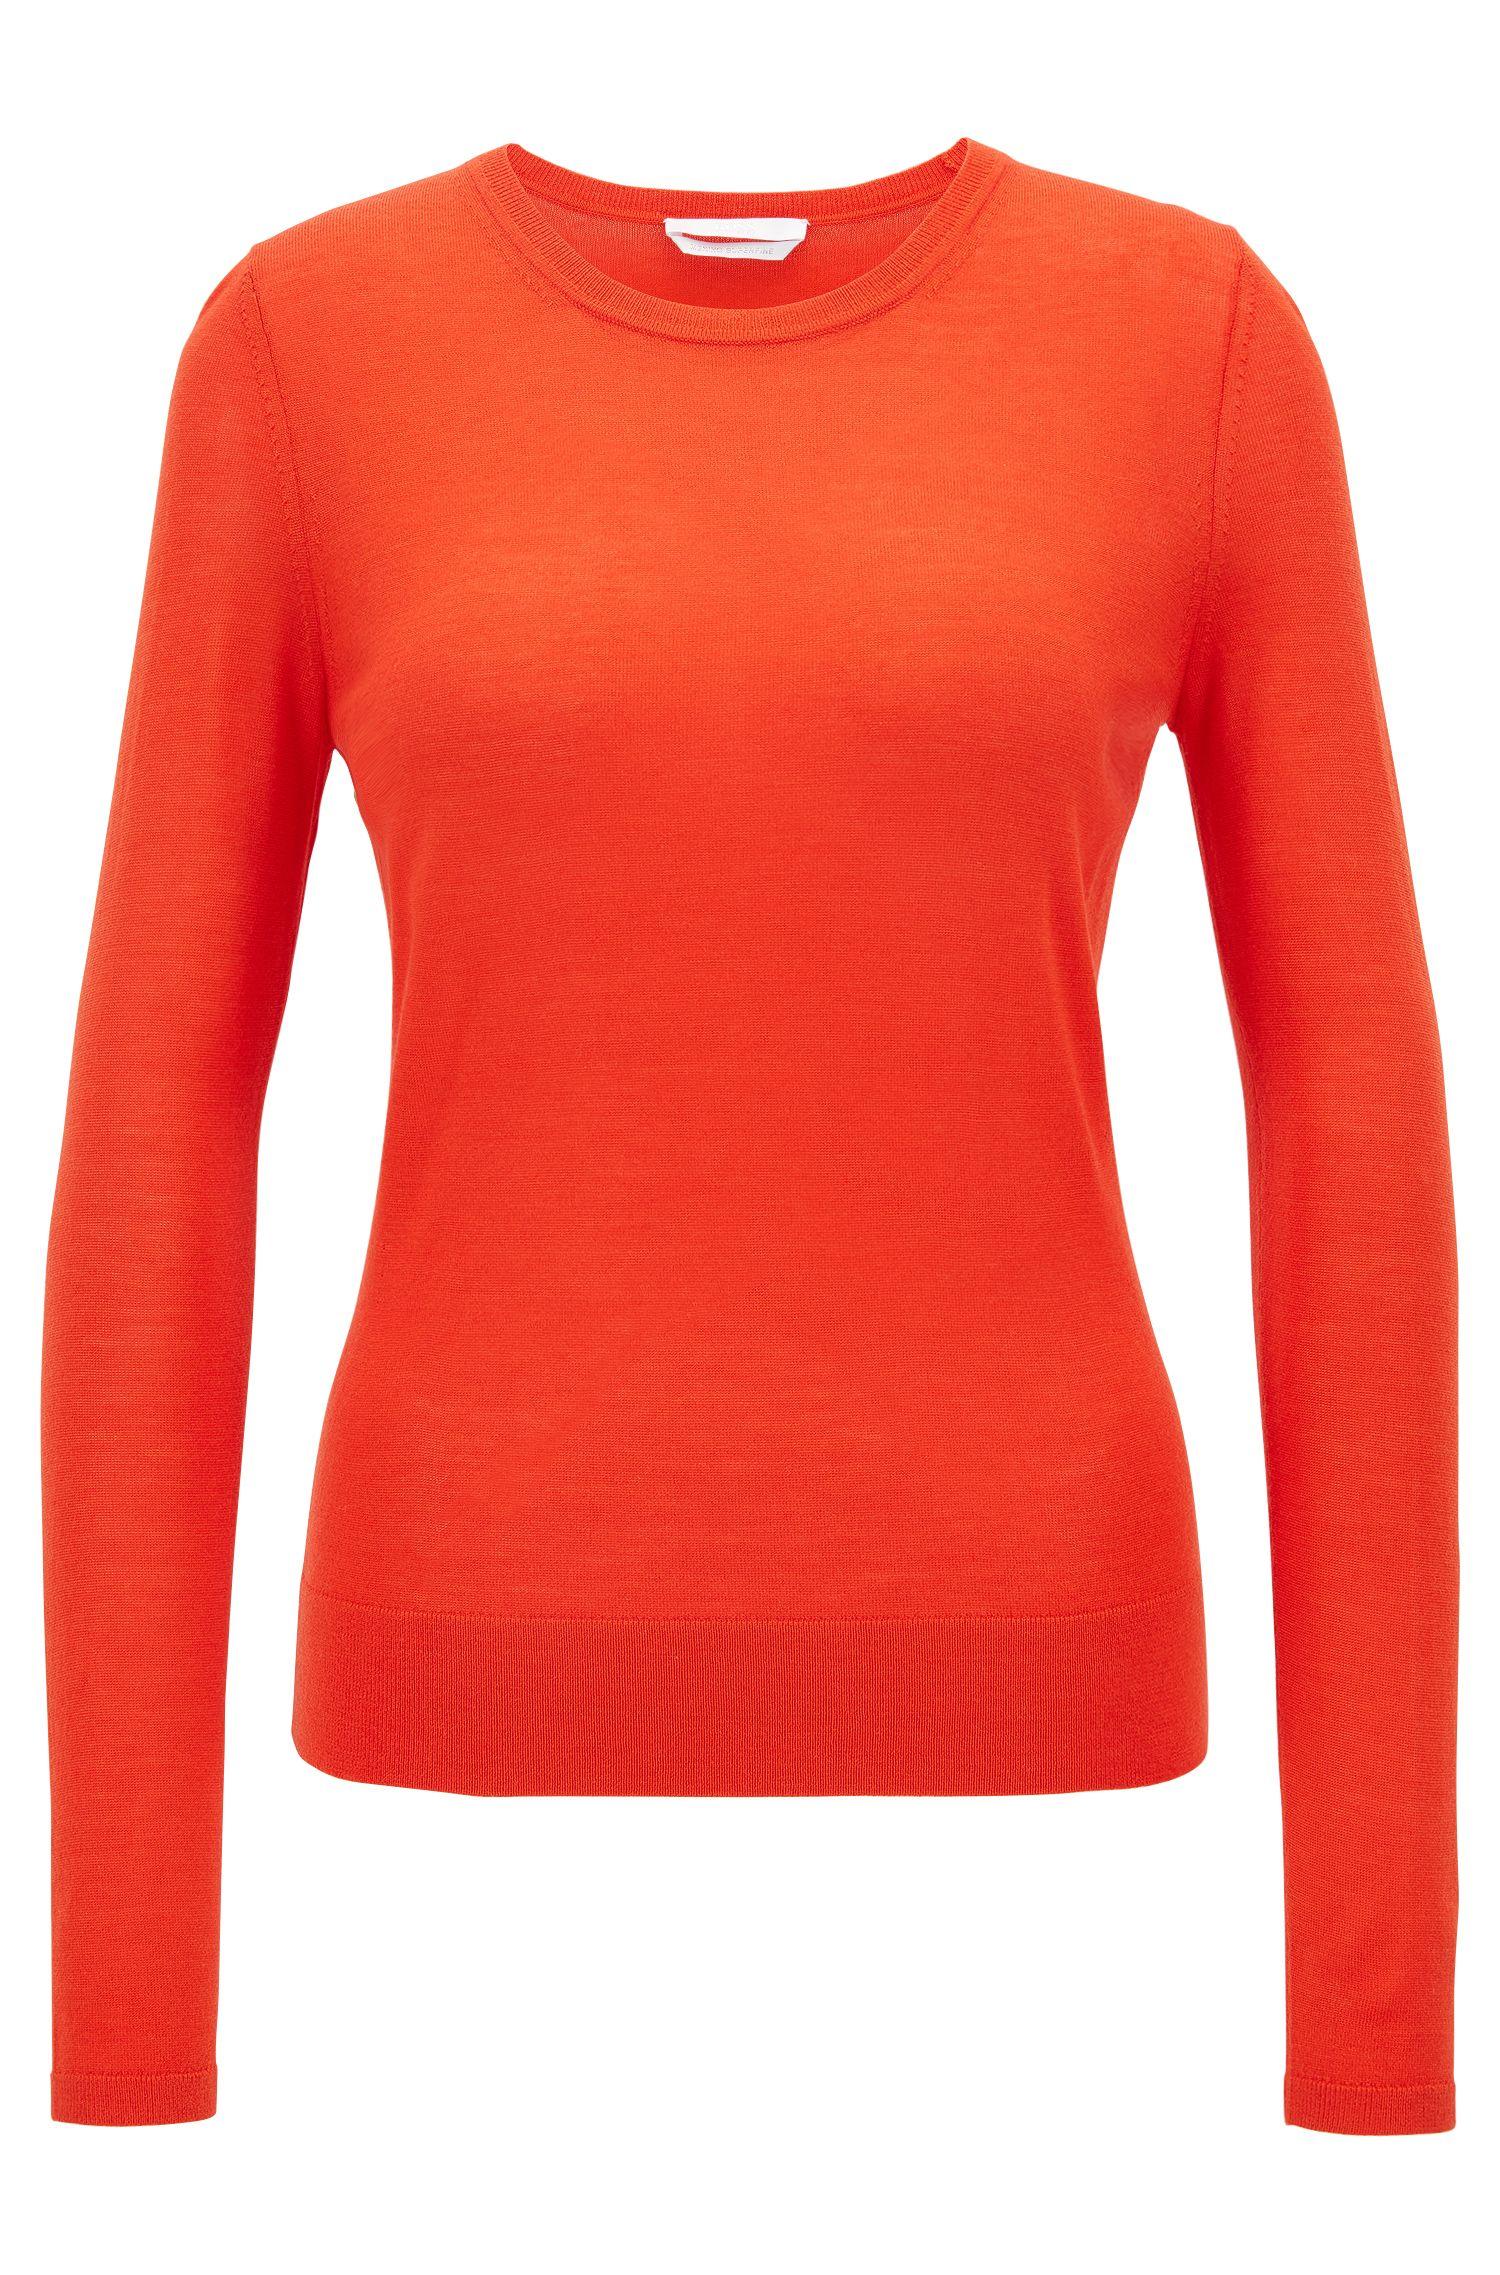 Crew-neck sweater in lightweight virgin wool